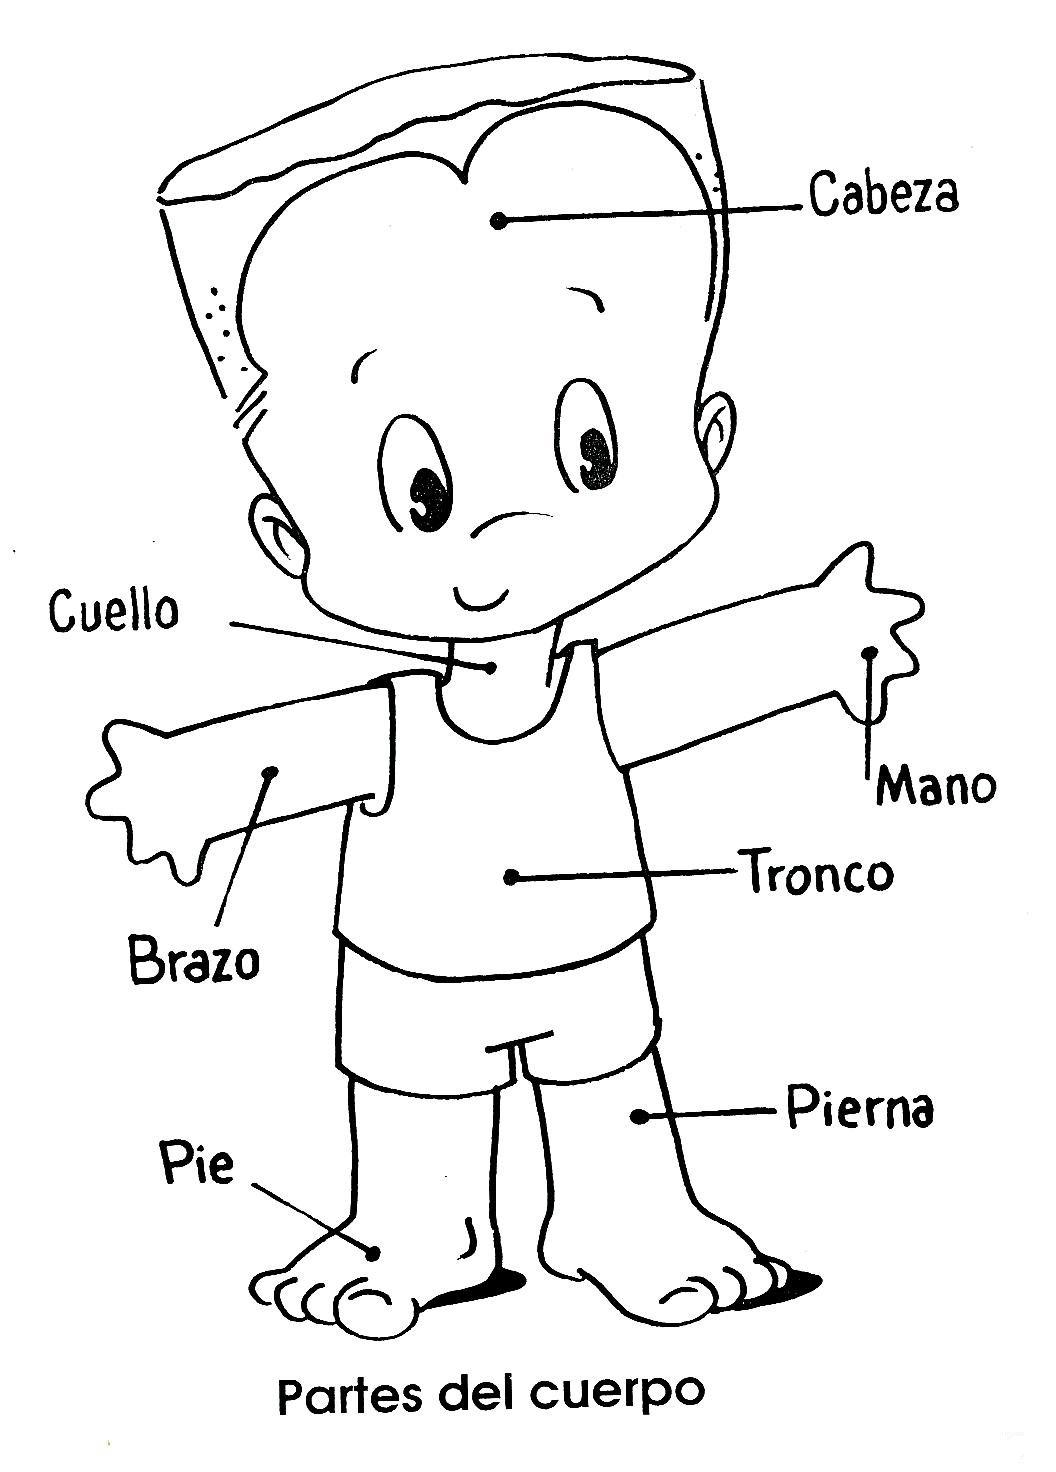 Dibujos para colorear niño - Dibujos para colorear - IMAGIXS